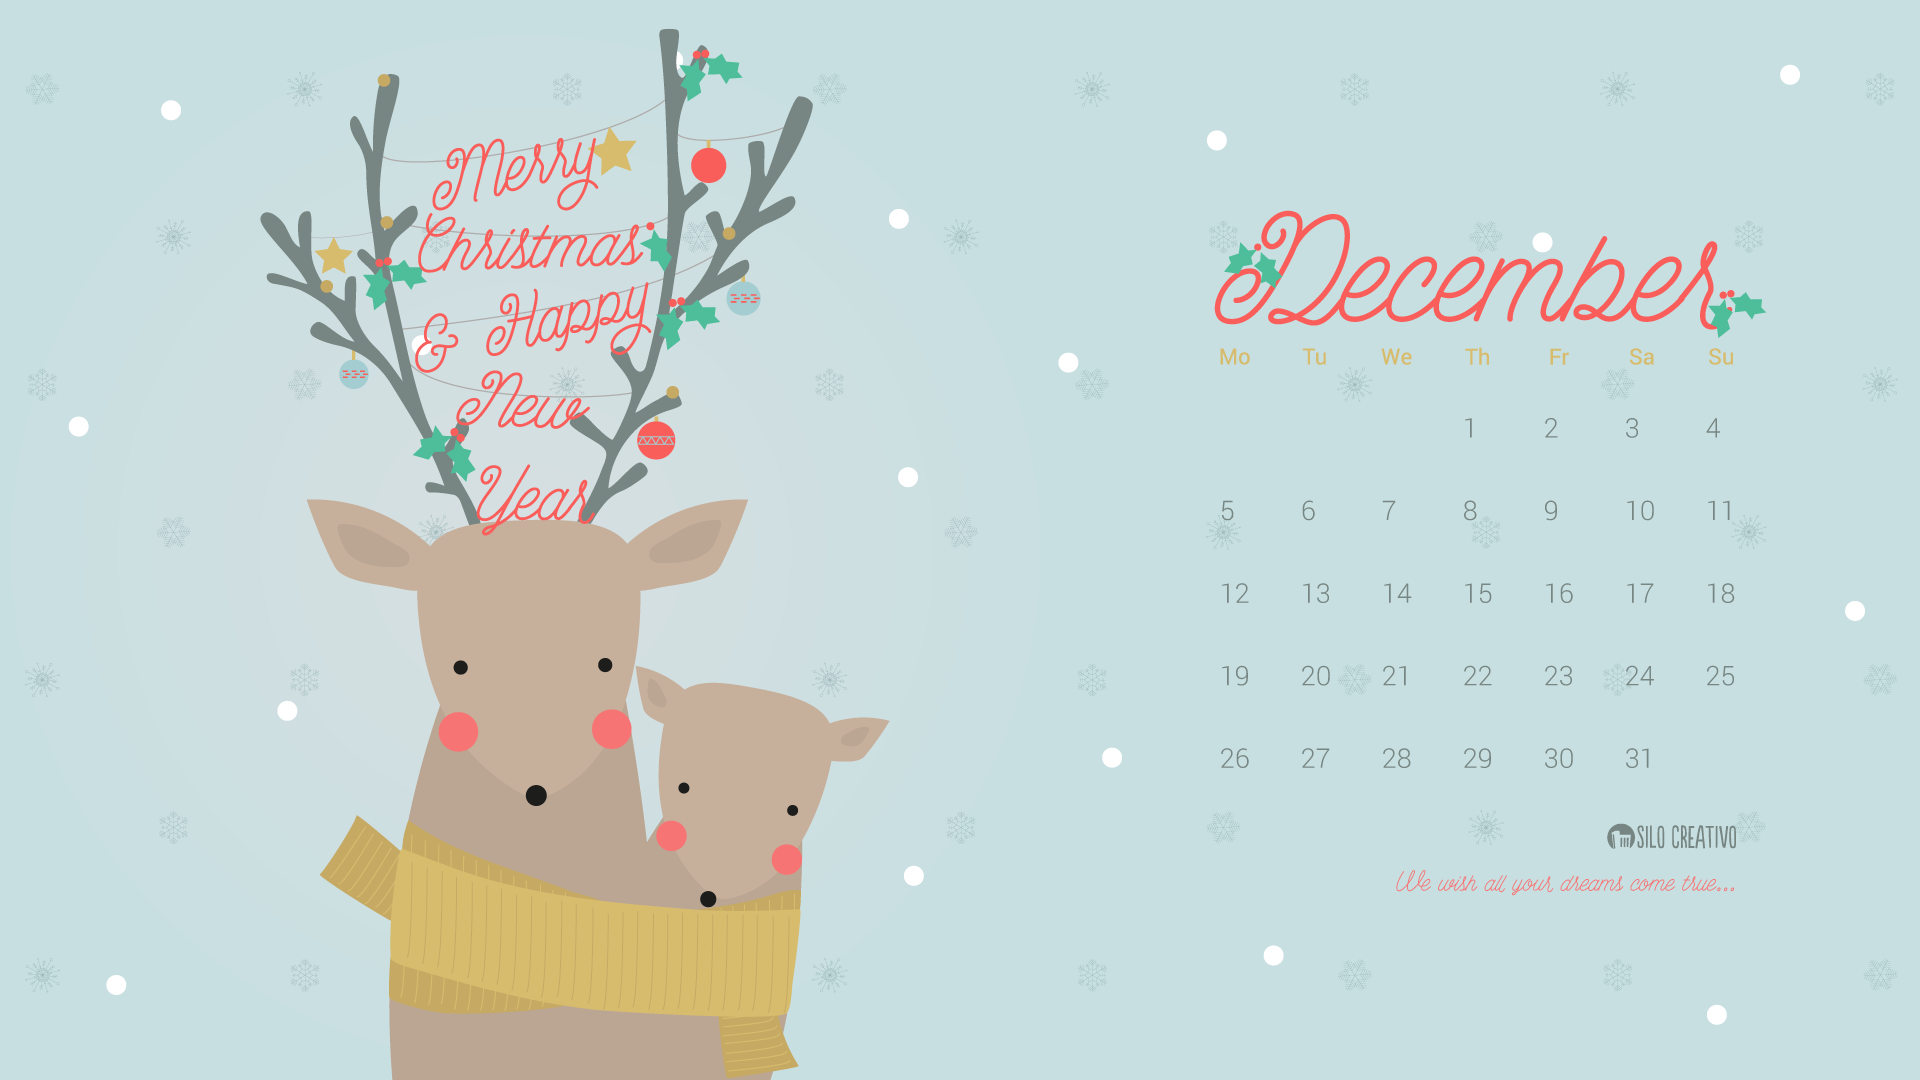 December 2017 -Jan 2019 Calendar Downloadable Calendar: December 2018 • Silo Creativo